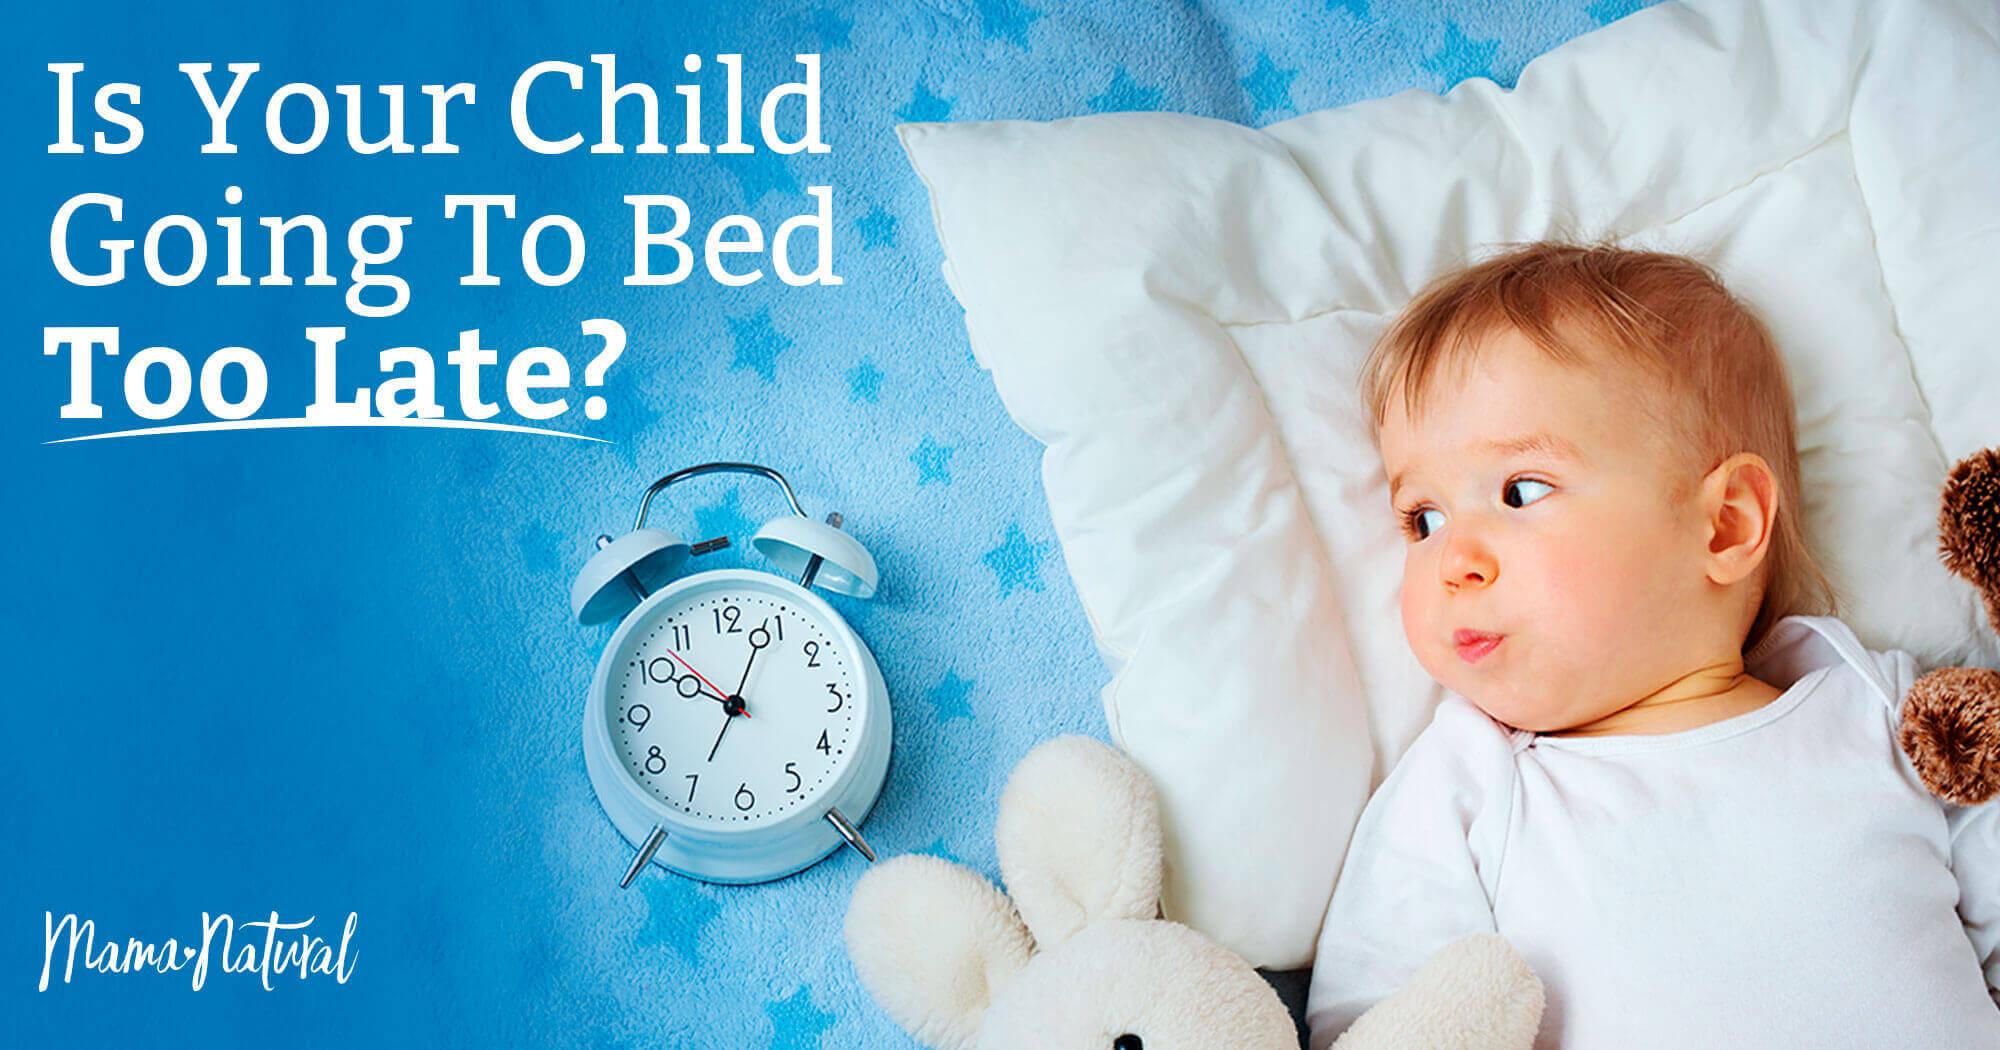 orari i gjumit te femijeve, kur duhet te flene femijet